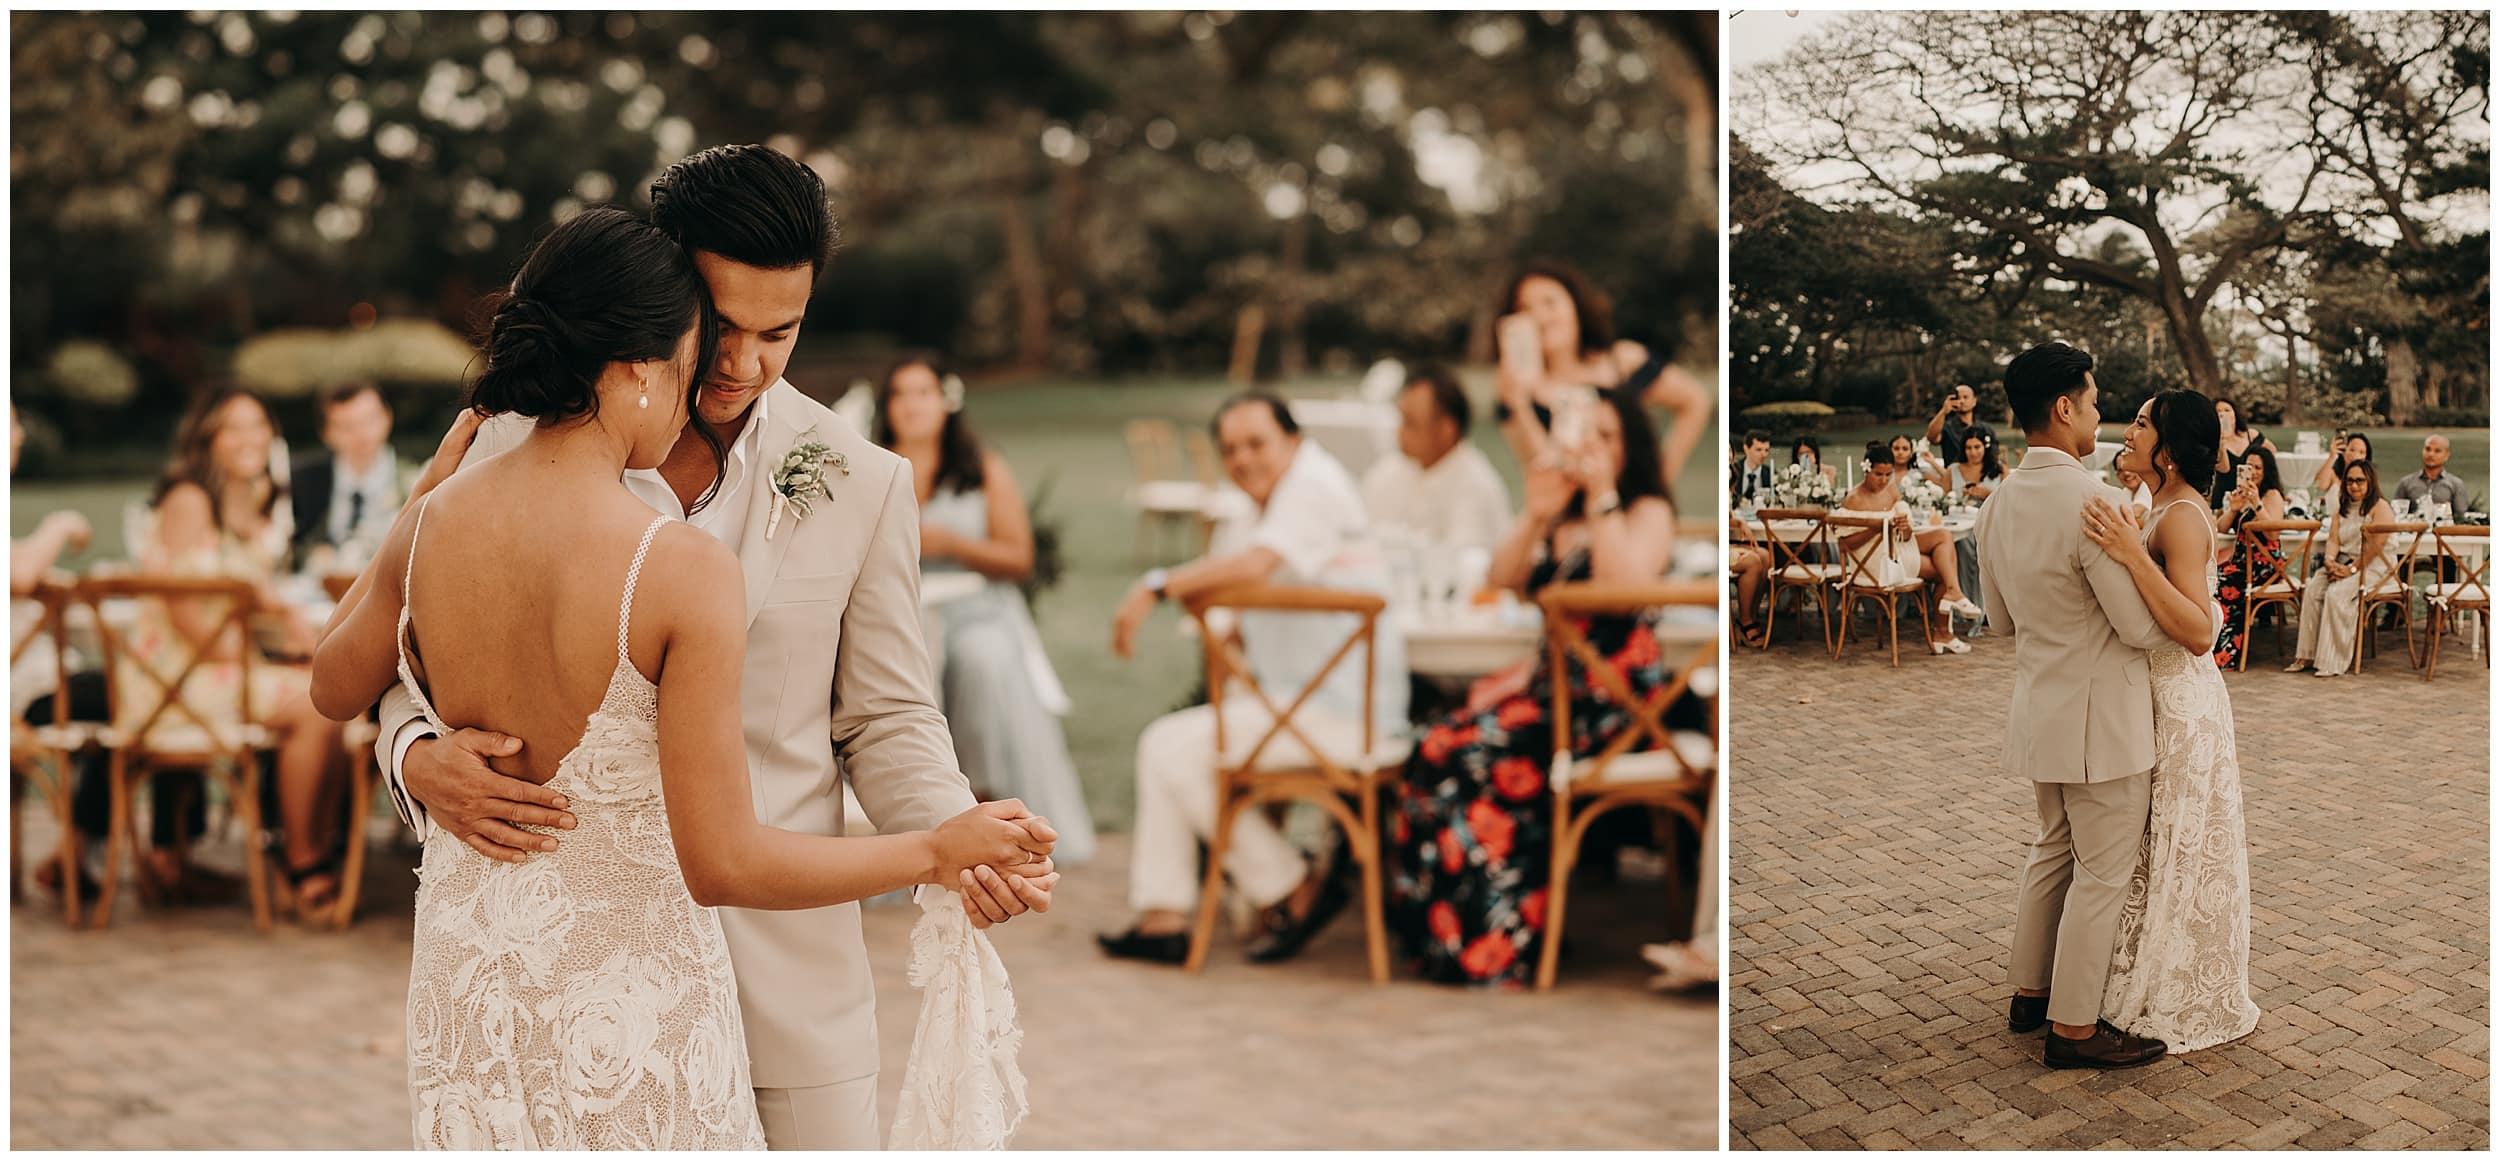 Maui wedding photography-10-11_0052